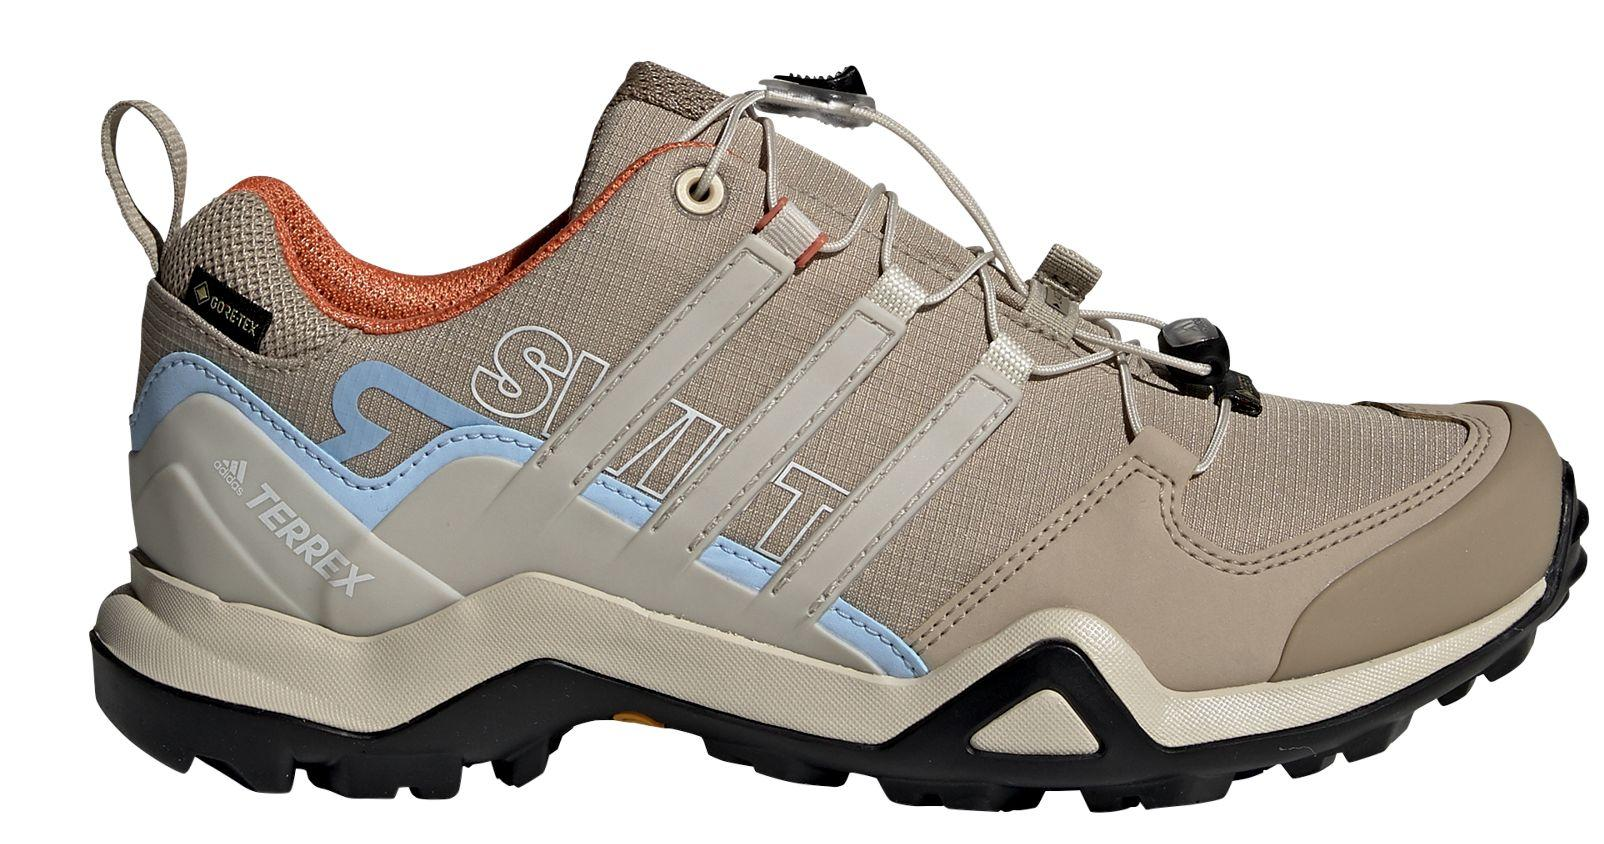 Adidas Damen Terrex Swift R2 GTX Wanderhalbschuh im Biwak